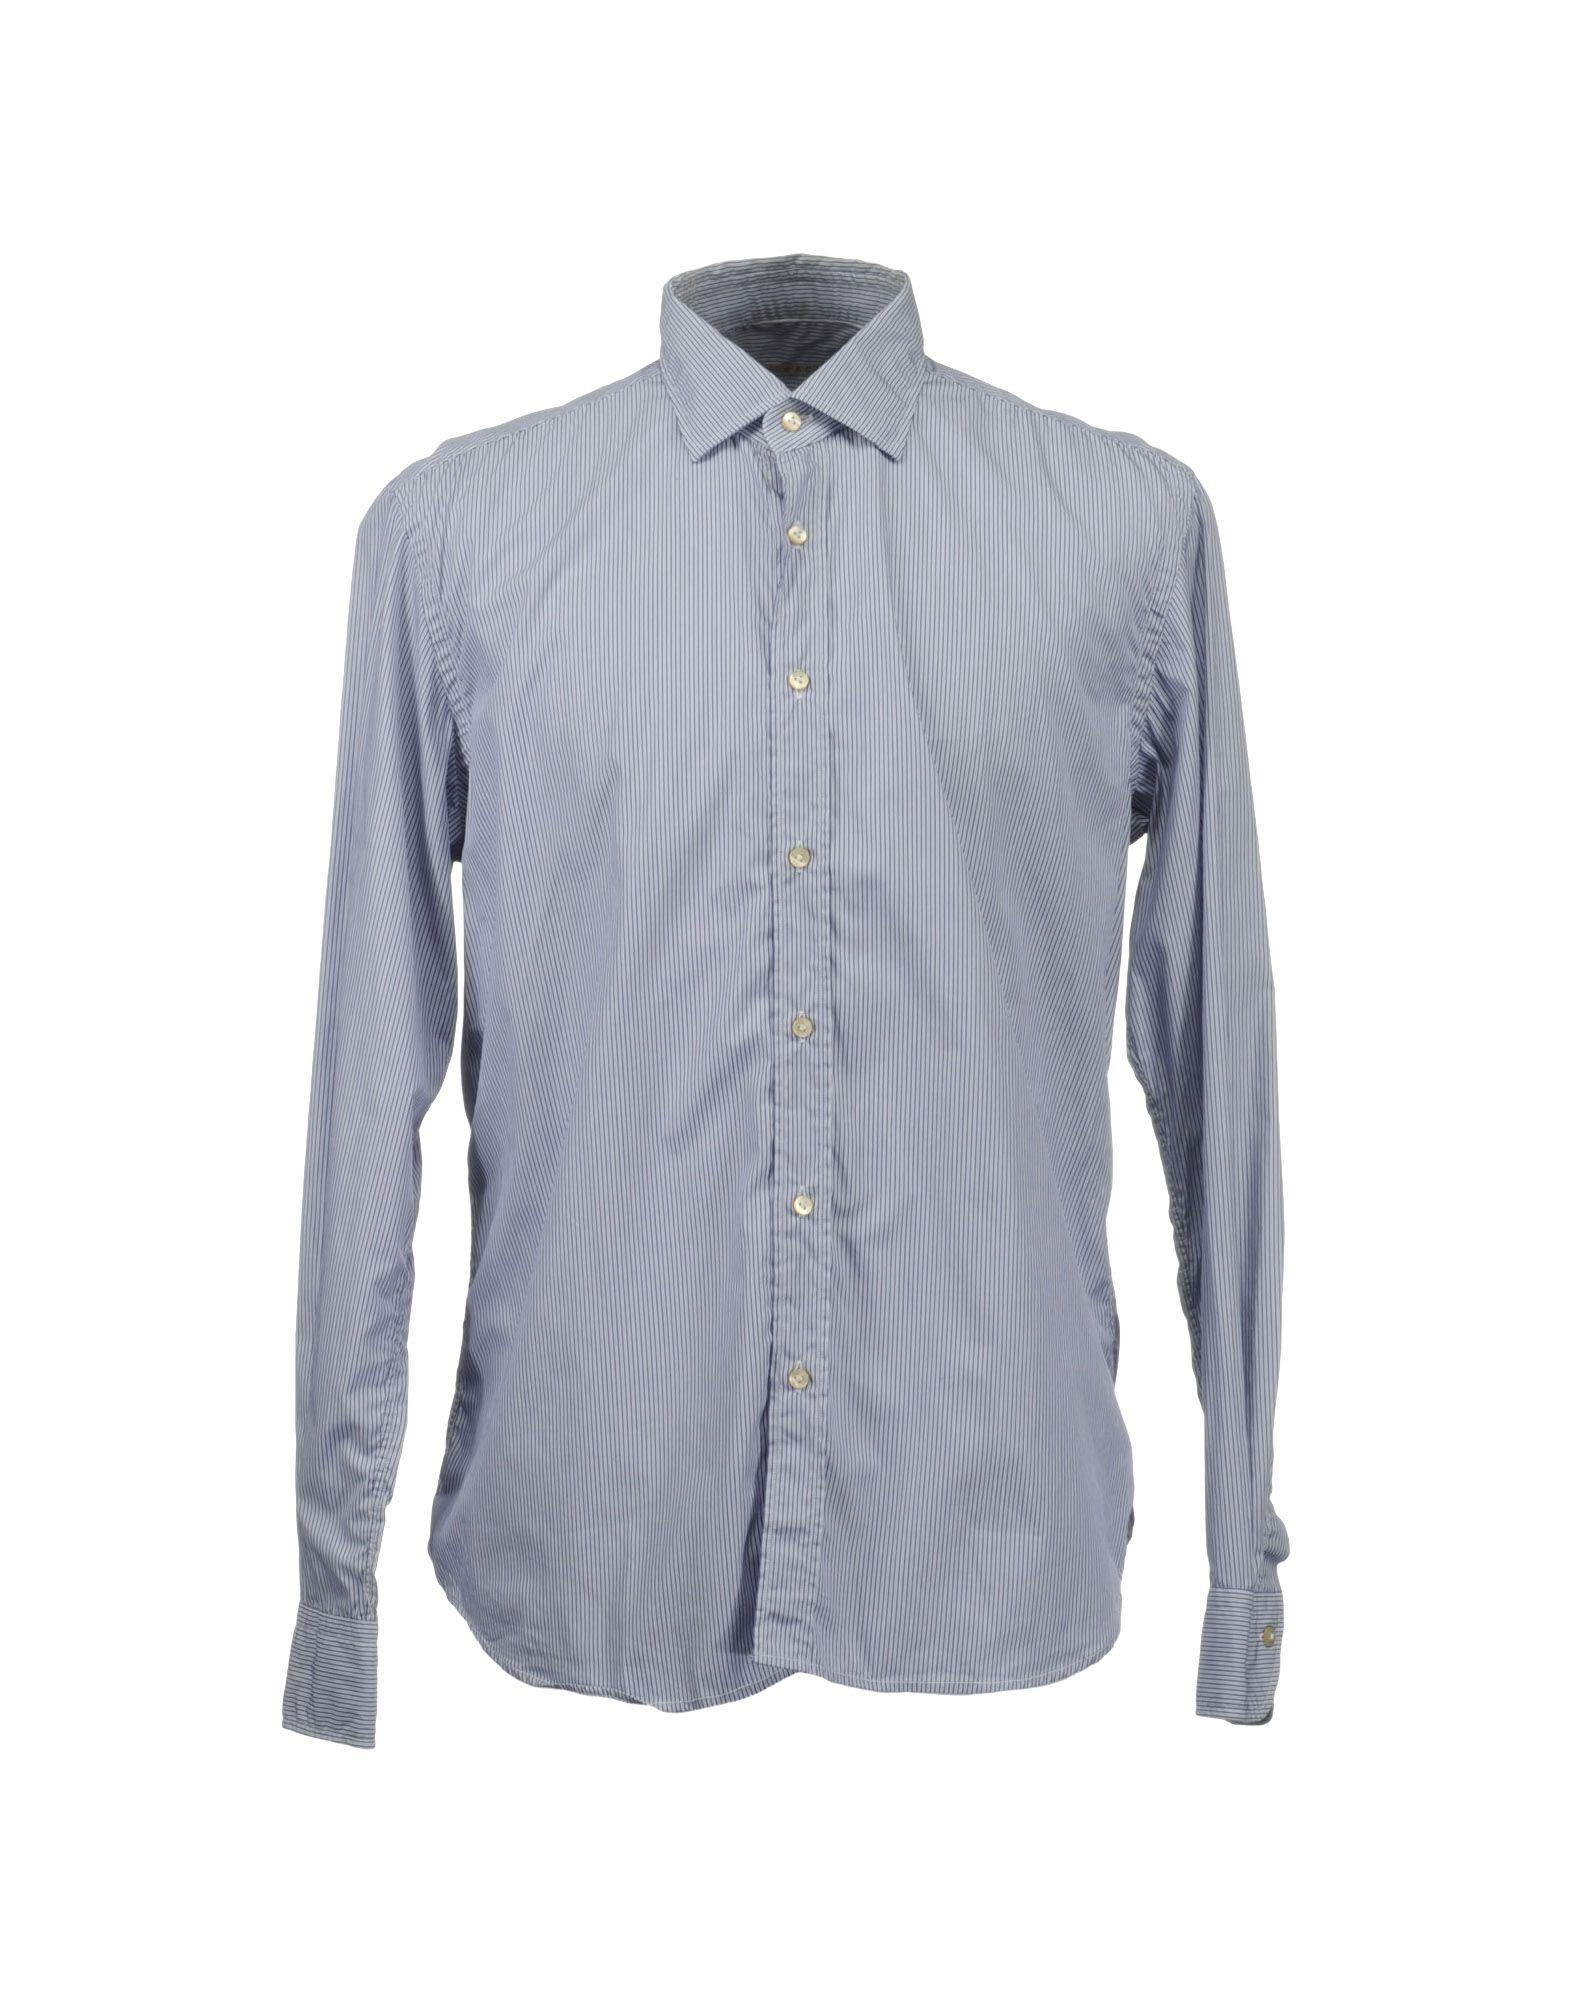 Фото - XACUS Рубашка с длинными рукавами рубашка однотонная с длинными рукавами